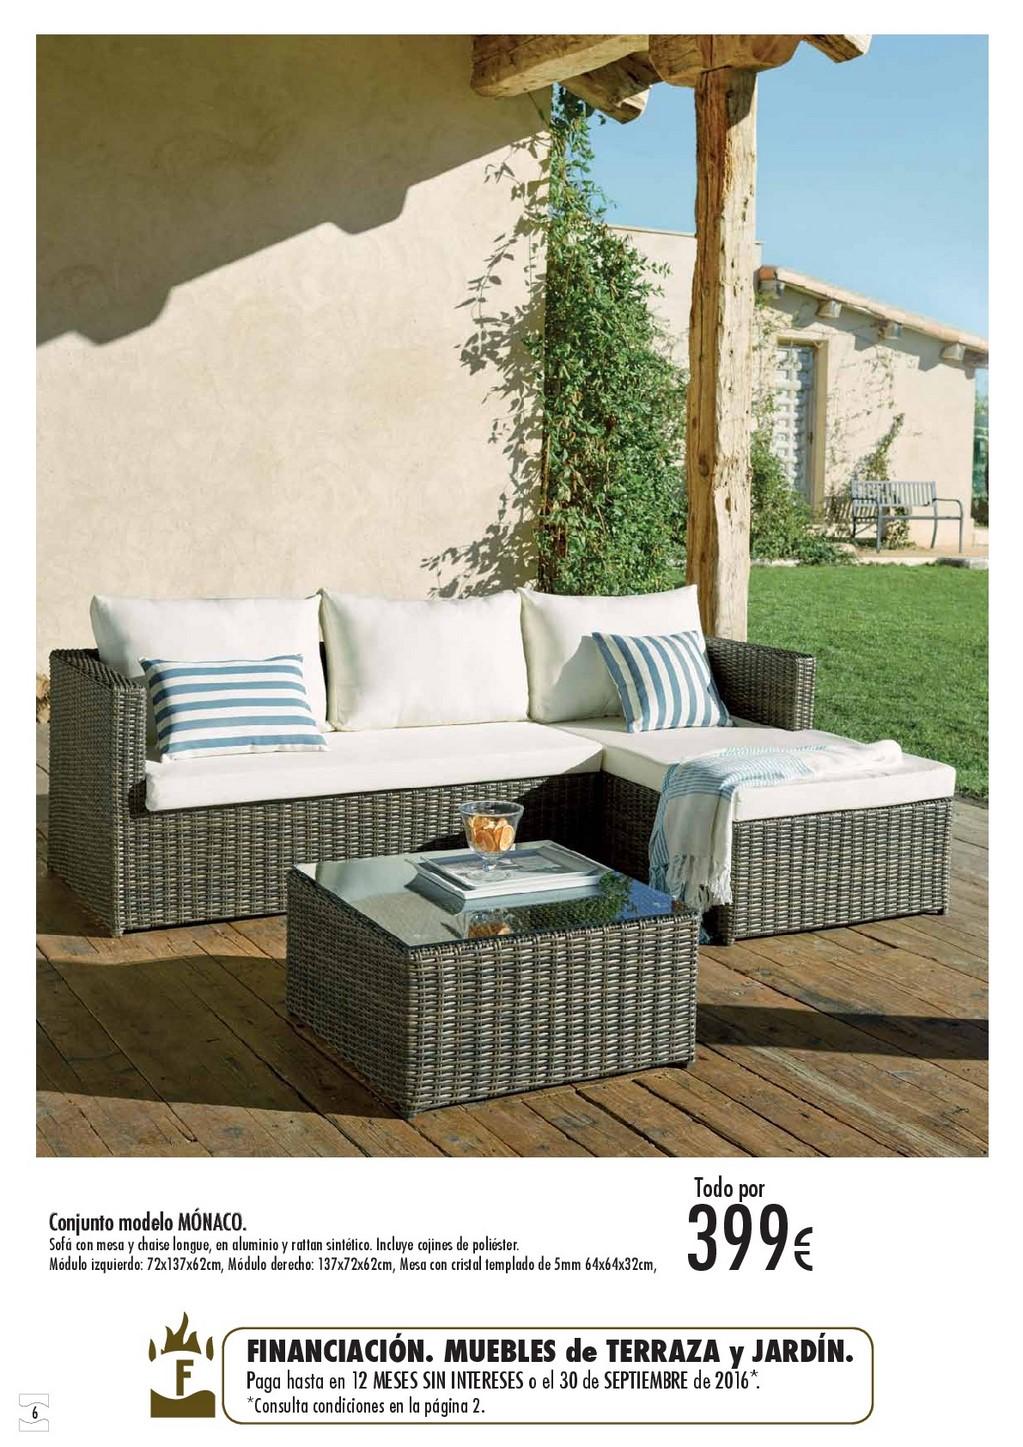 Terraza y jardin hipercor 20166 for Oferta terraza y jardin